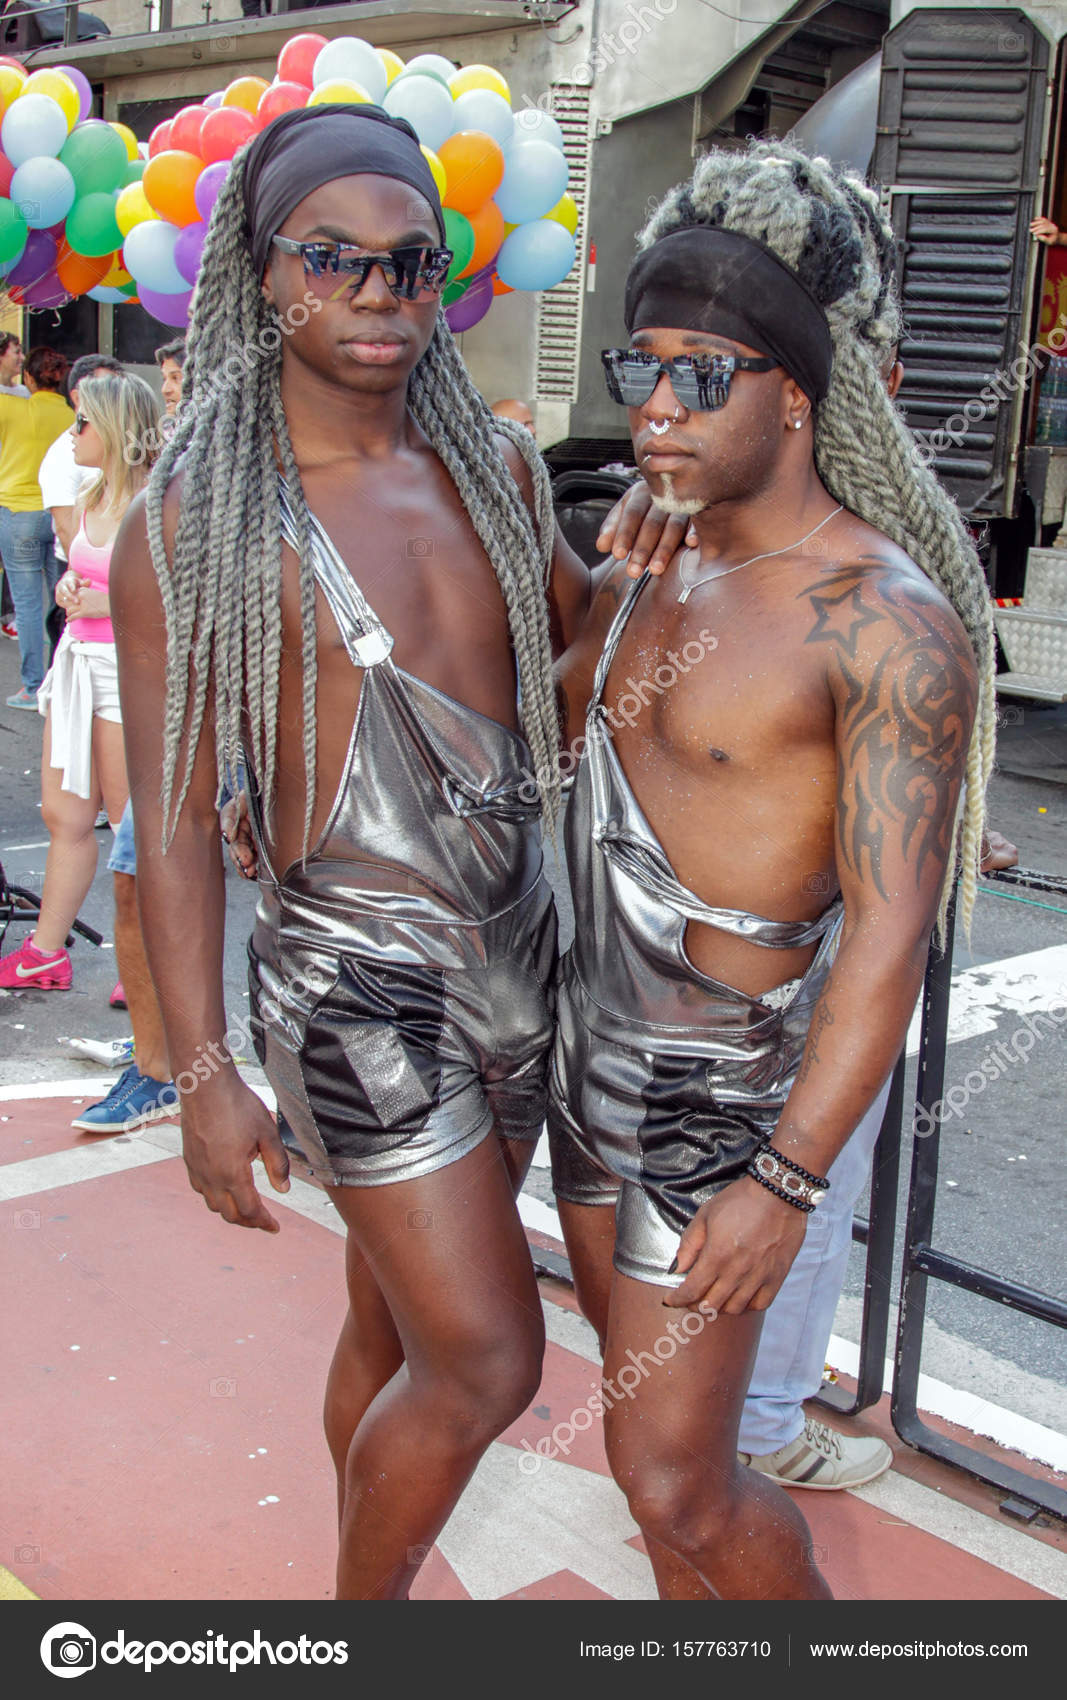 Black cruise gay lesbian pride travel girls